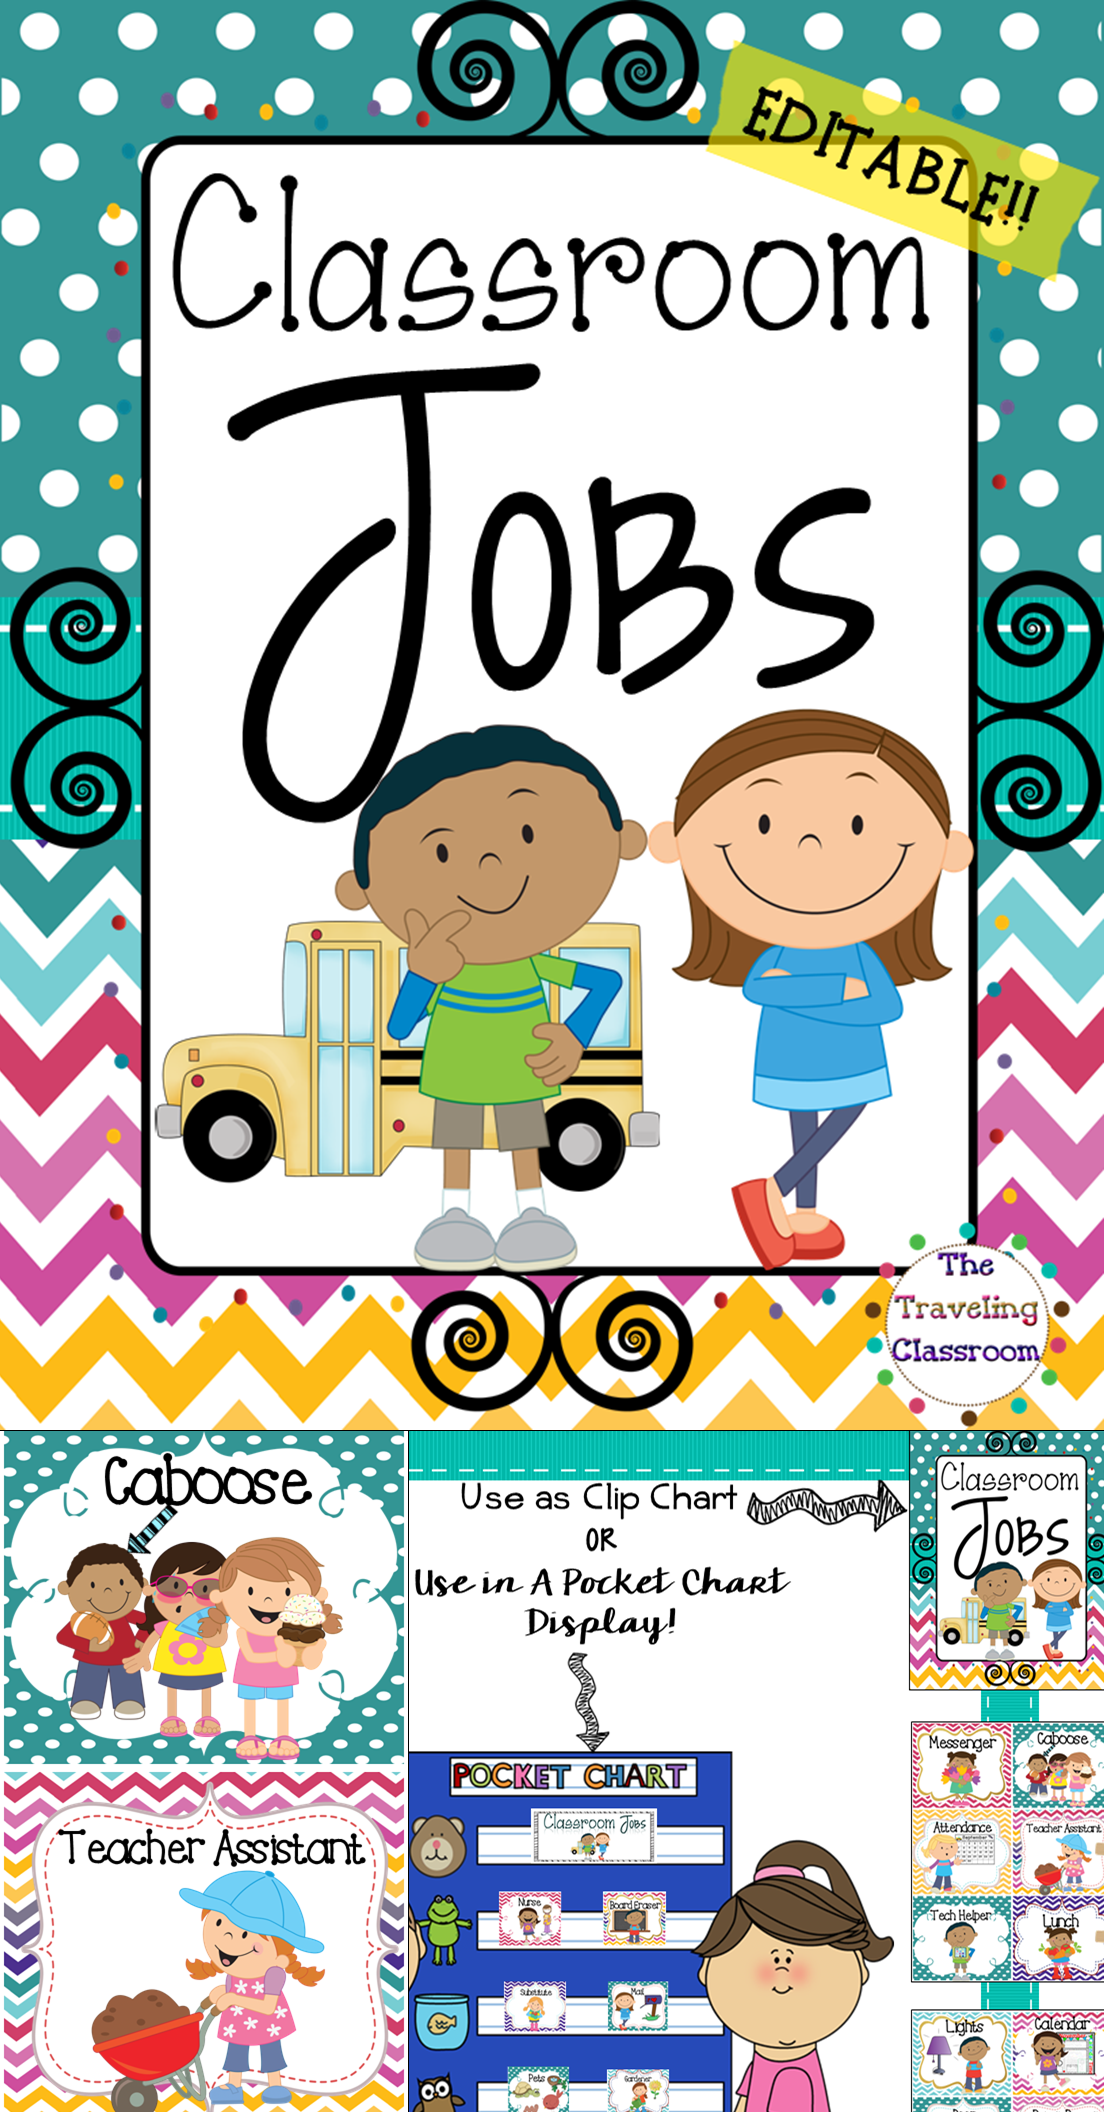 Classroom Jobs Classroom Decor Chevron Polka Dot Theme